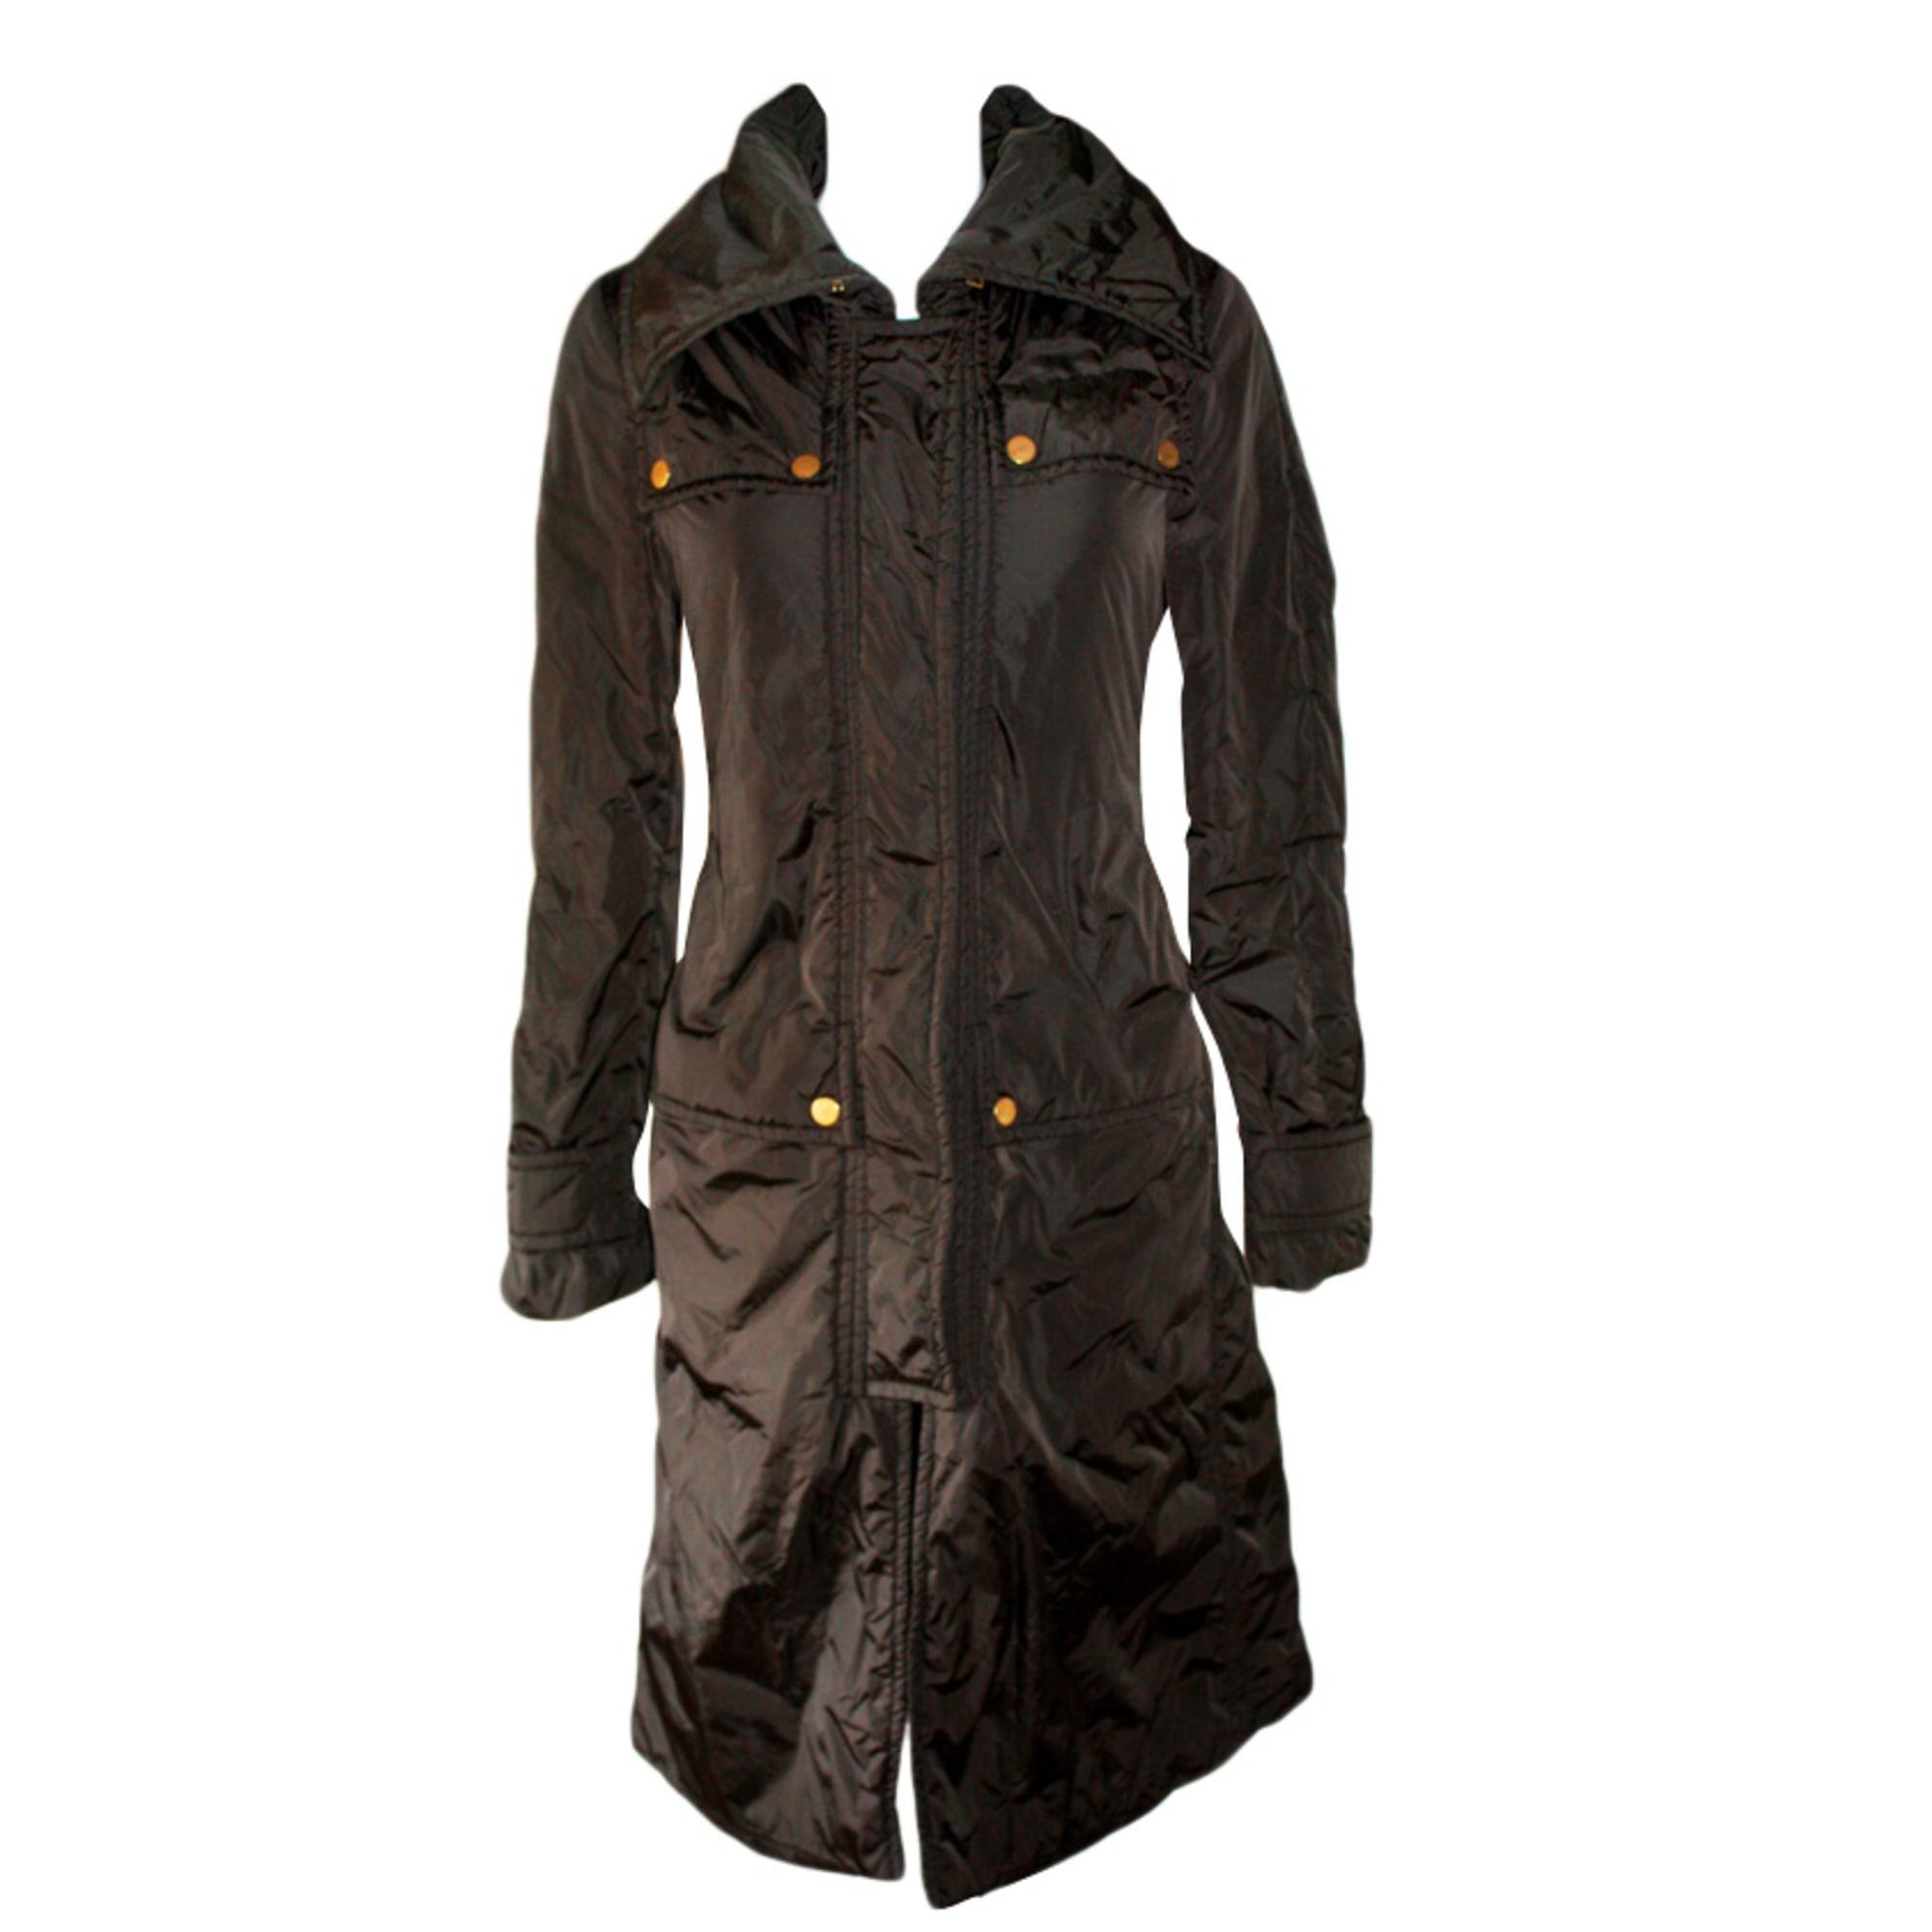 Doudoune GUCCI 42 (L XL, T4) marron vendu par Garde robe de luxe ... 02ffe9cdb62